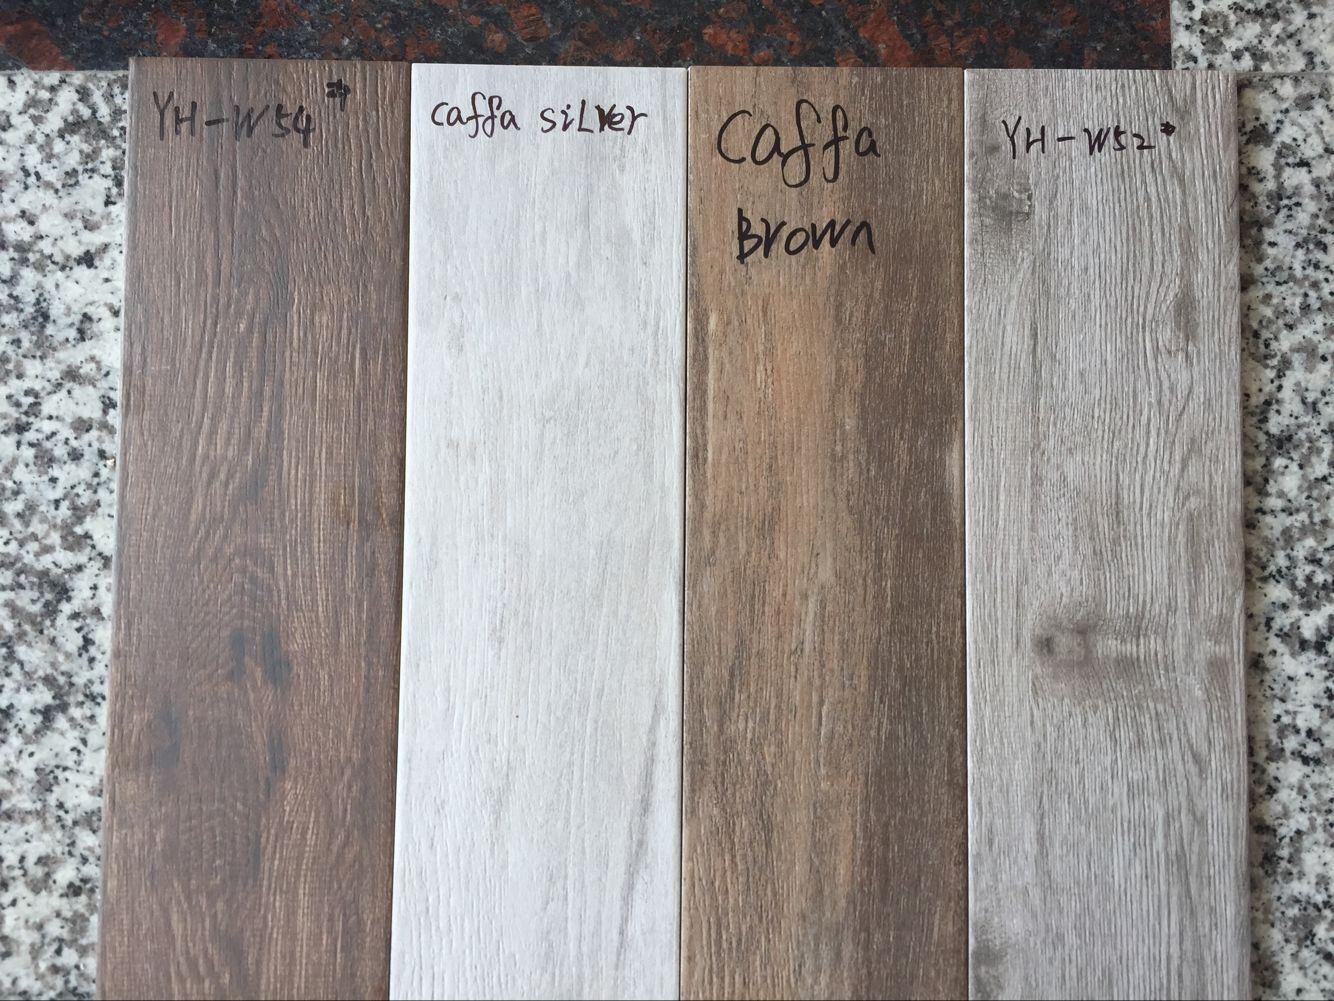 China 6x20 timber look porcelain tile flooring tile porcelain 6x20 timber look porcelain tile flooring tile porcelain floor tile dailygadgetfo Choice Image